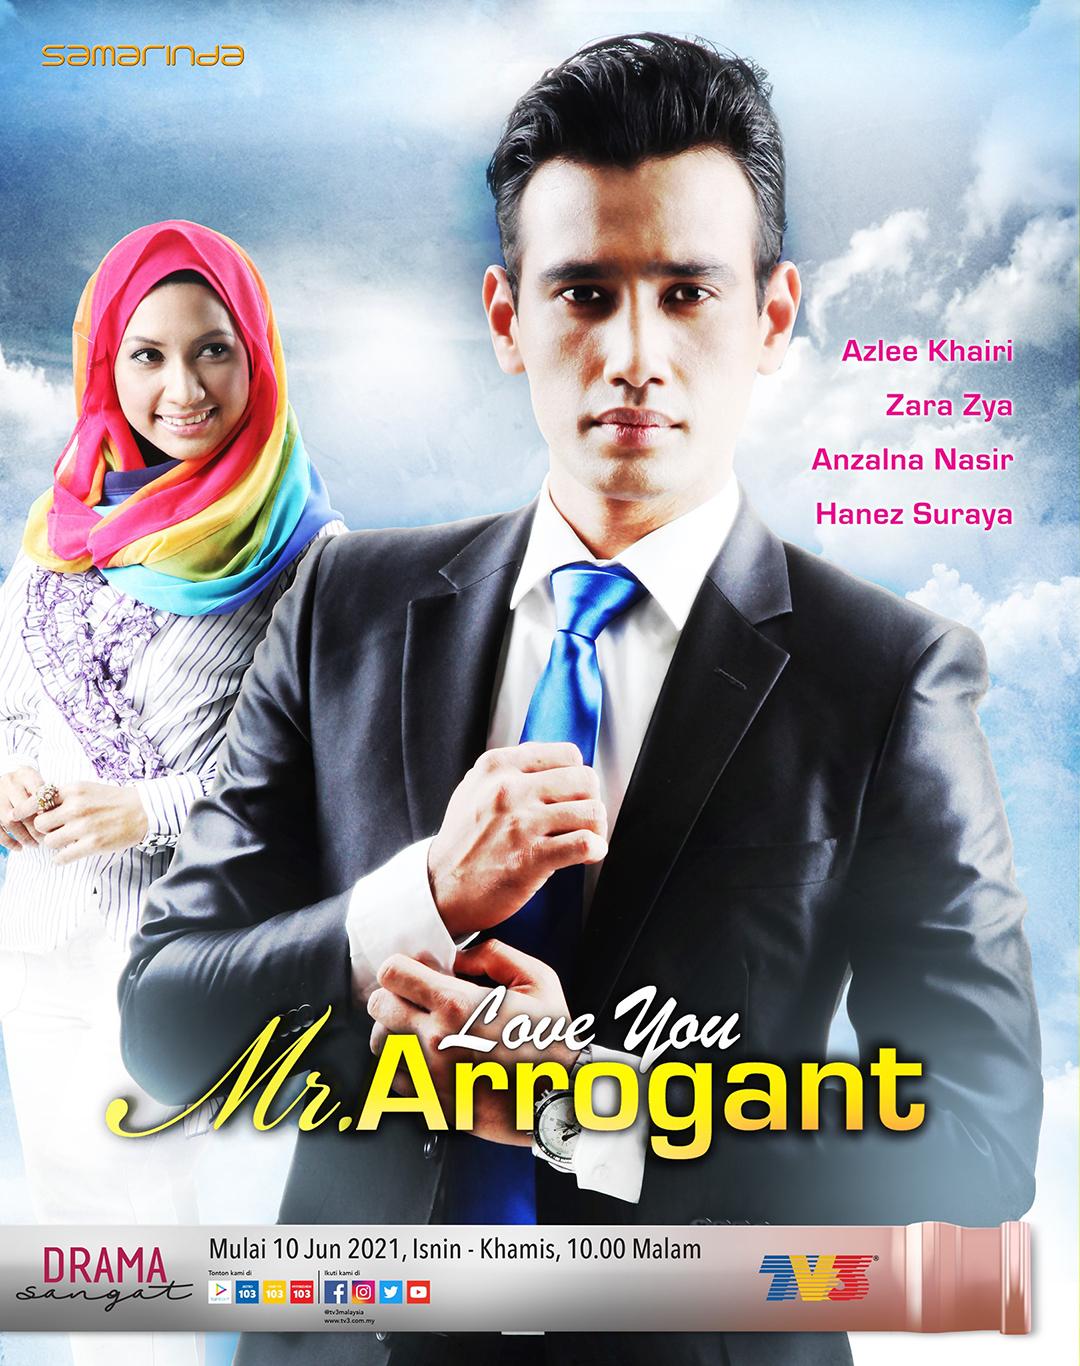 Drama Love You Mr. Arrogant TV3